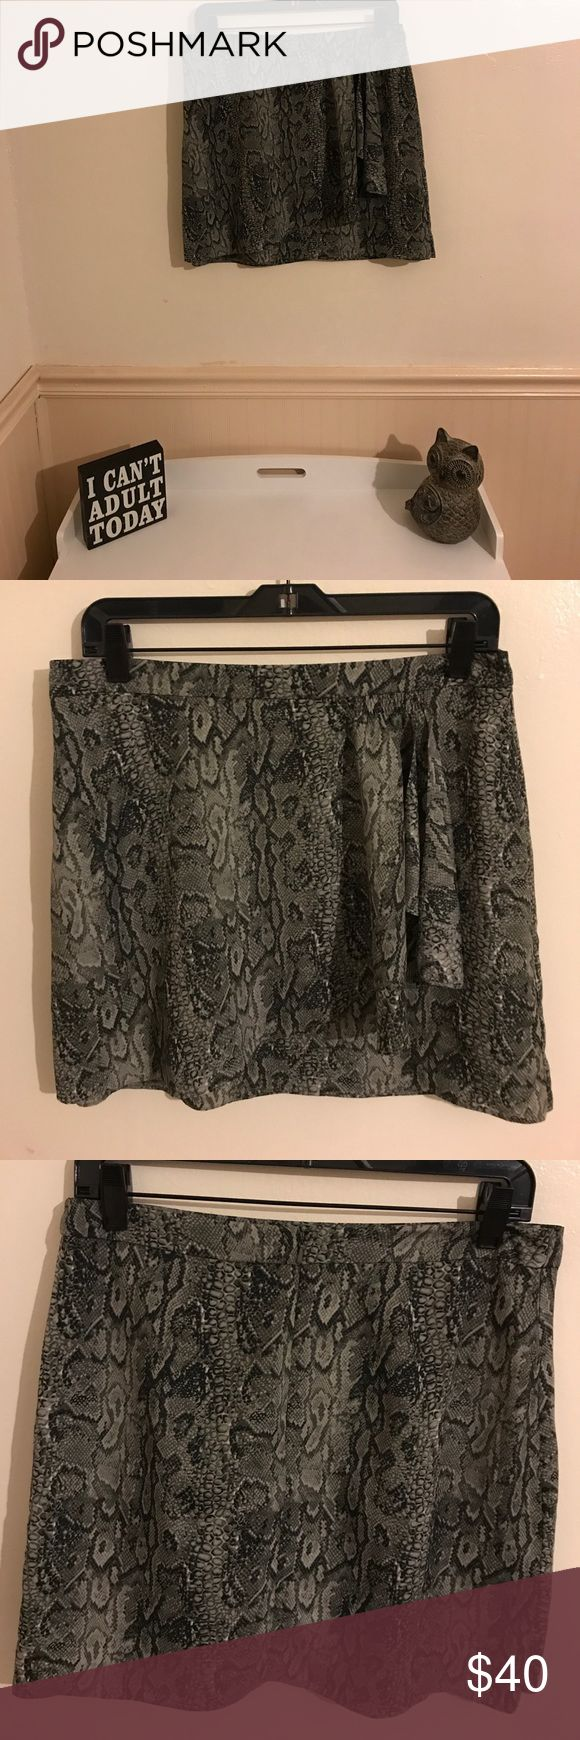 BCBGMaxAzria skirt Grey print reptile skirt. Hits mid thigh. Worn once. Zipper closure. BCBGMaxAzria Skirts Mini